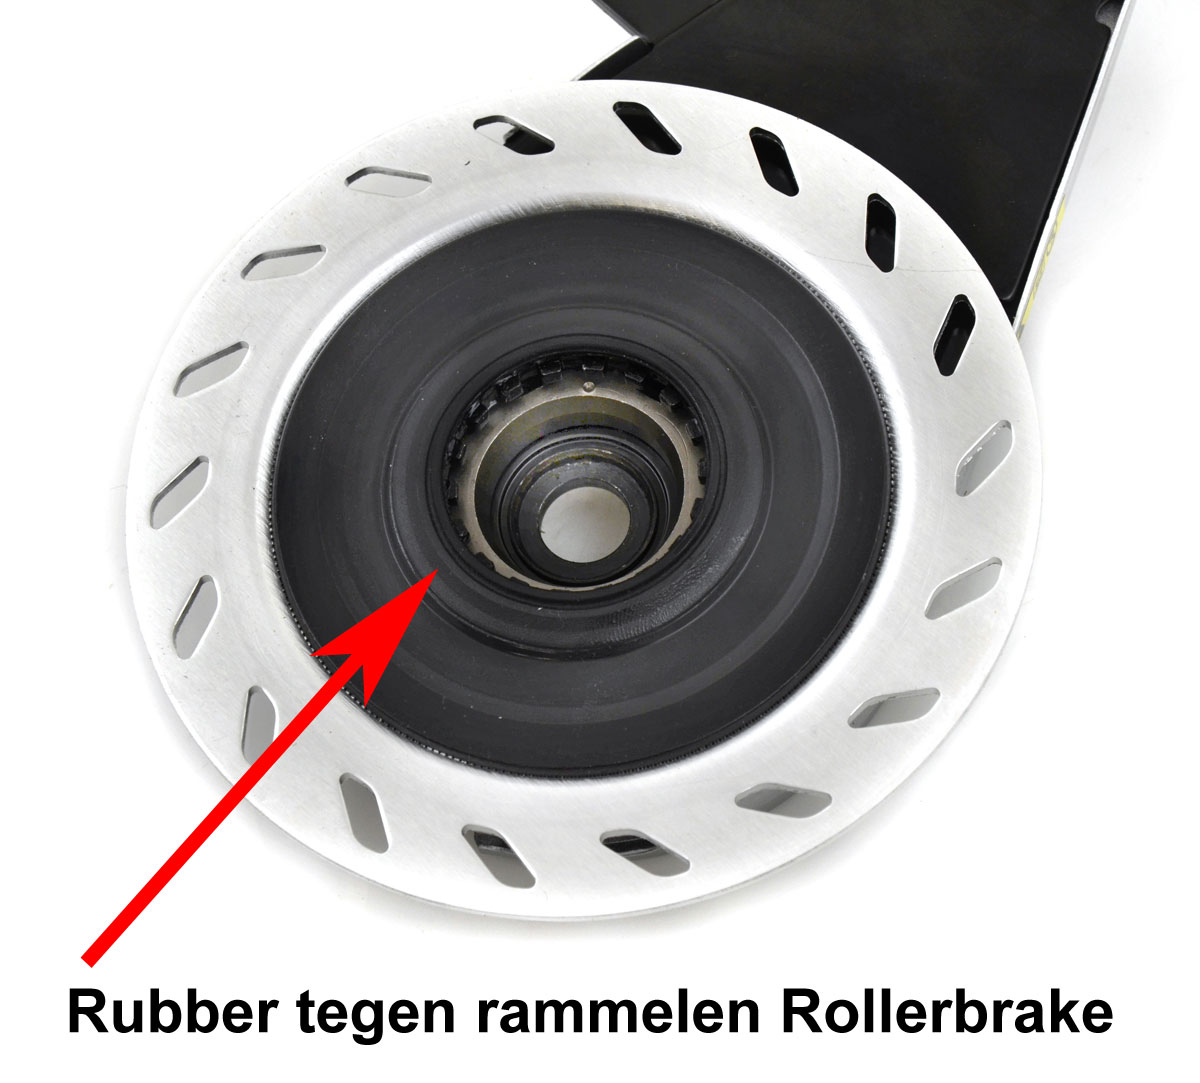 Rubber op Shimano rollerbrake tegen rammelen